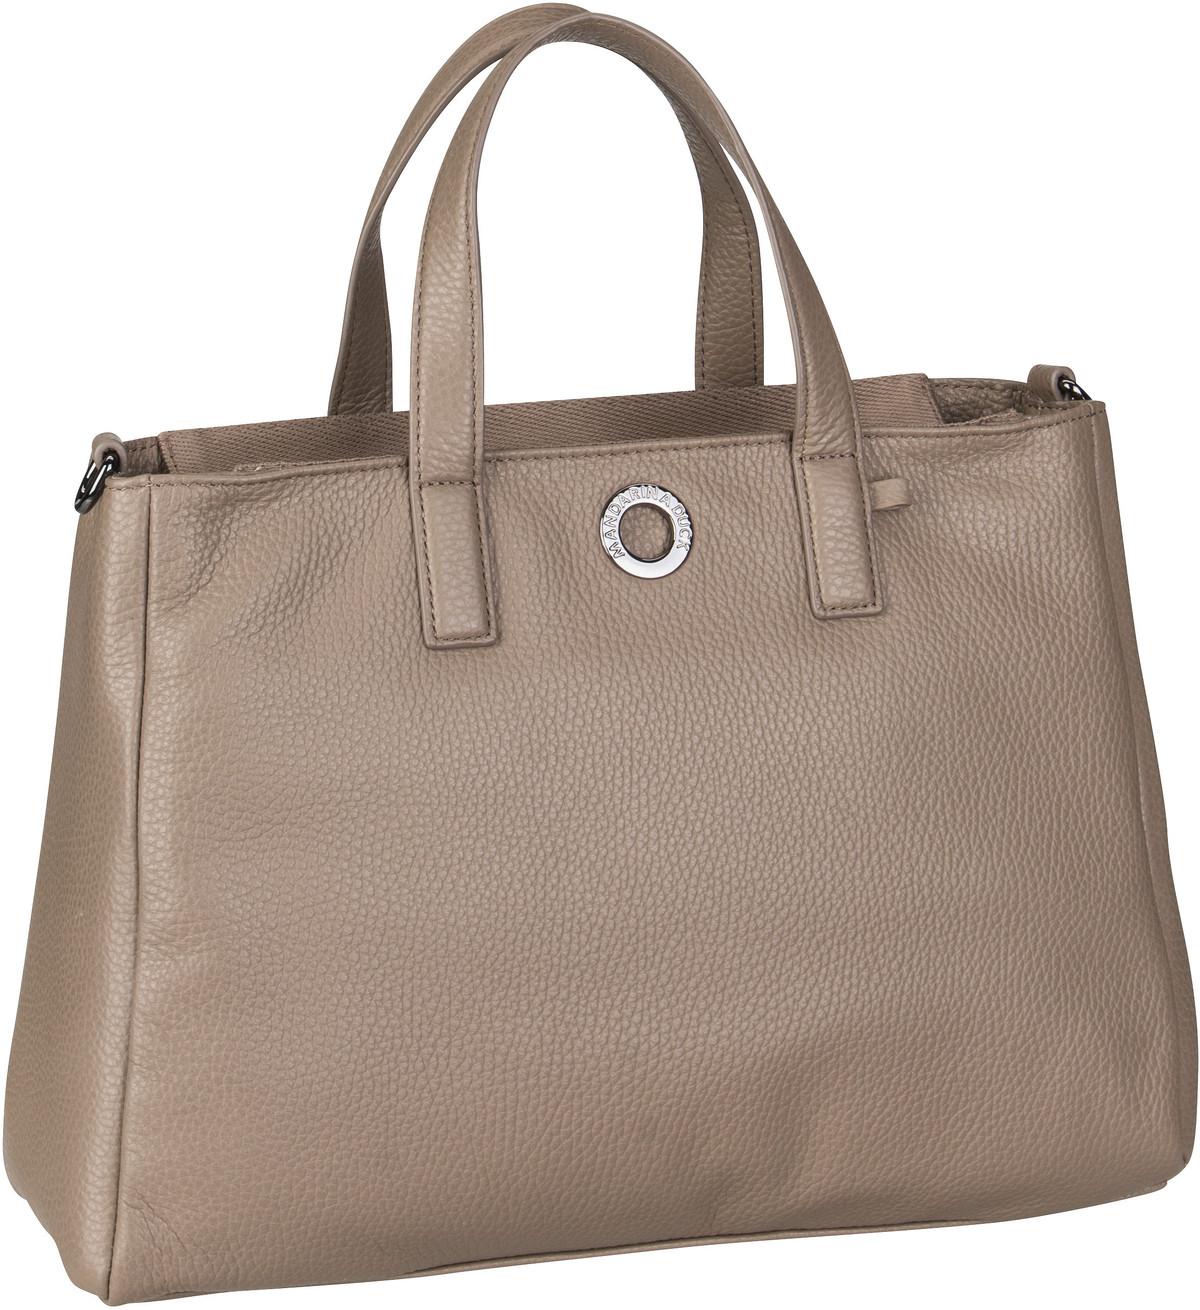 Handtasche Mellow Leather Tote Bag FZT26 Amphora